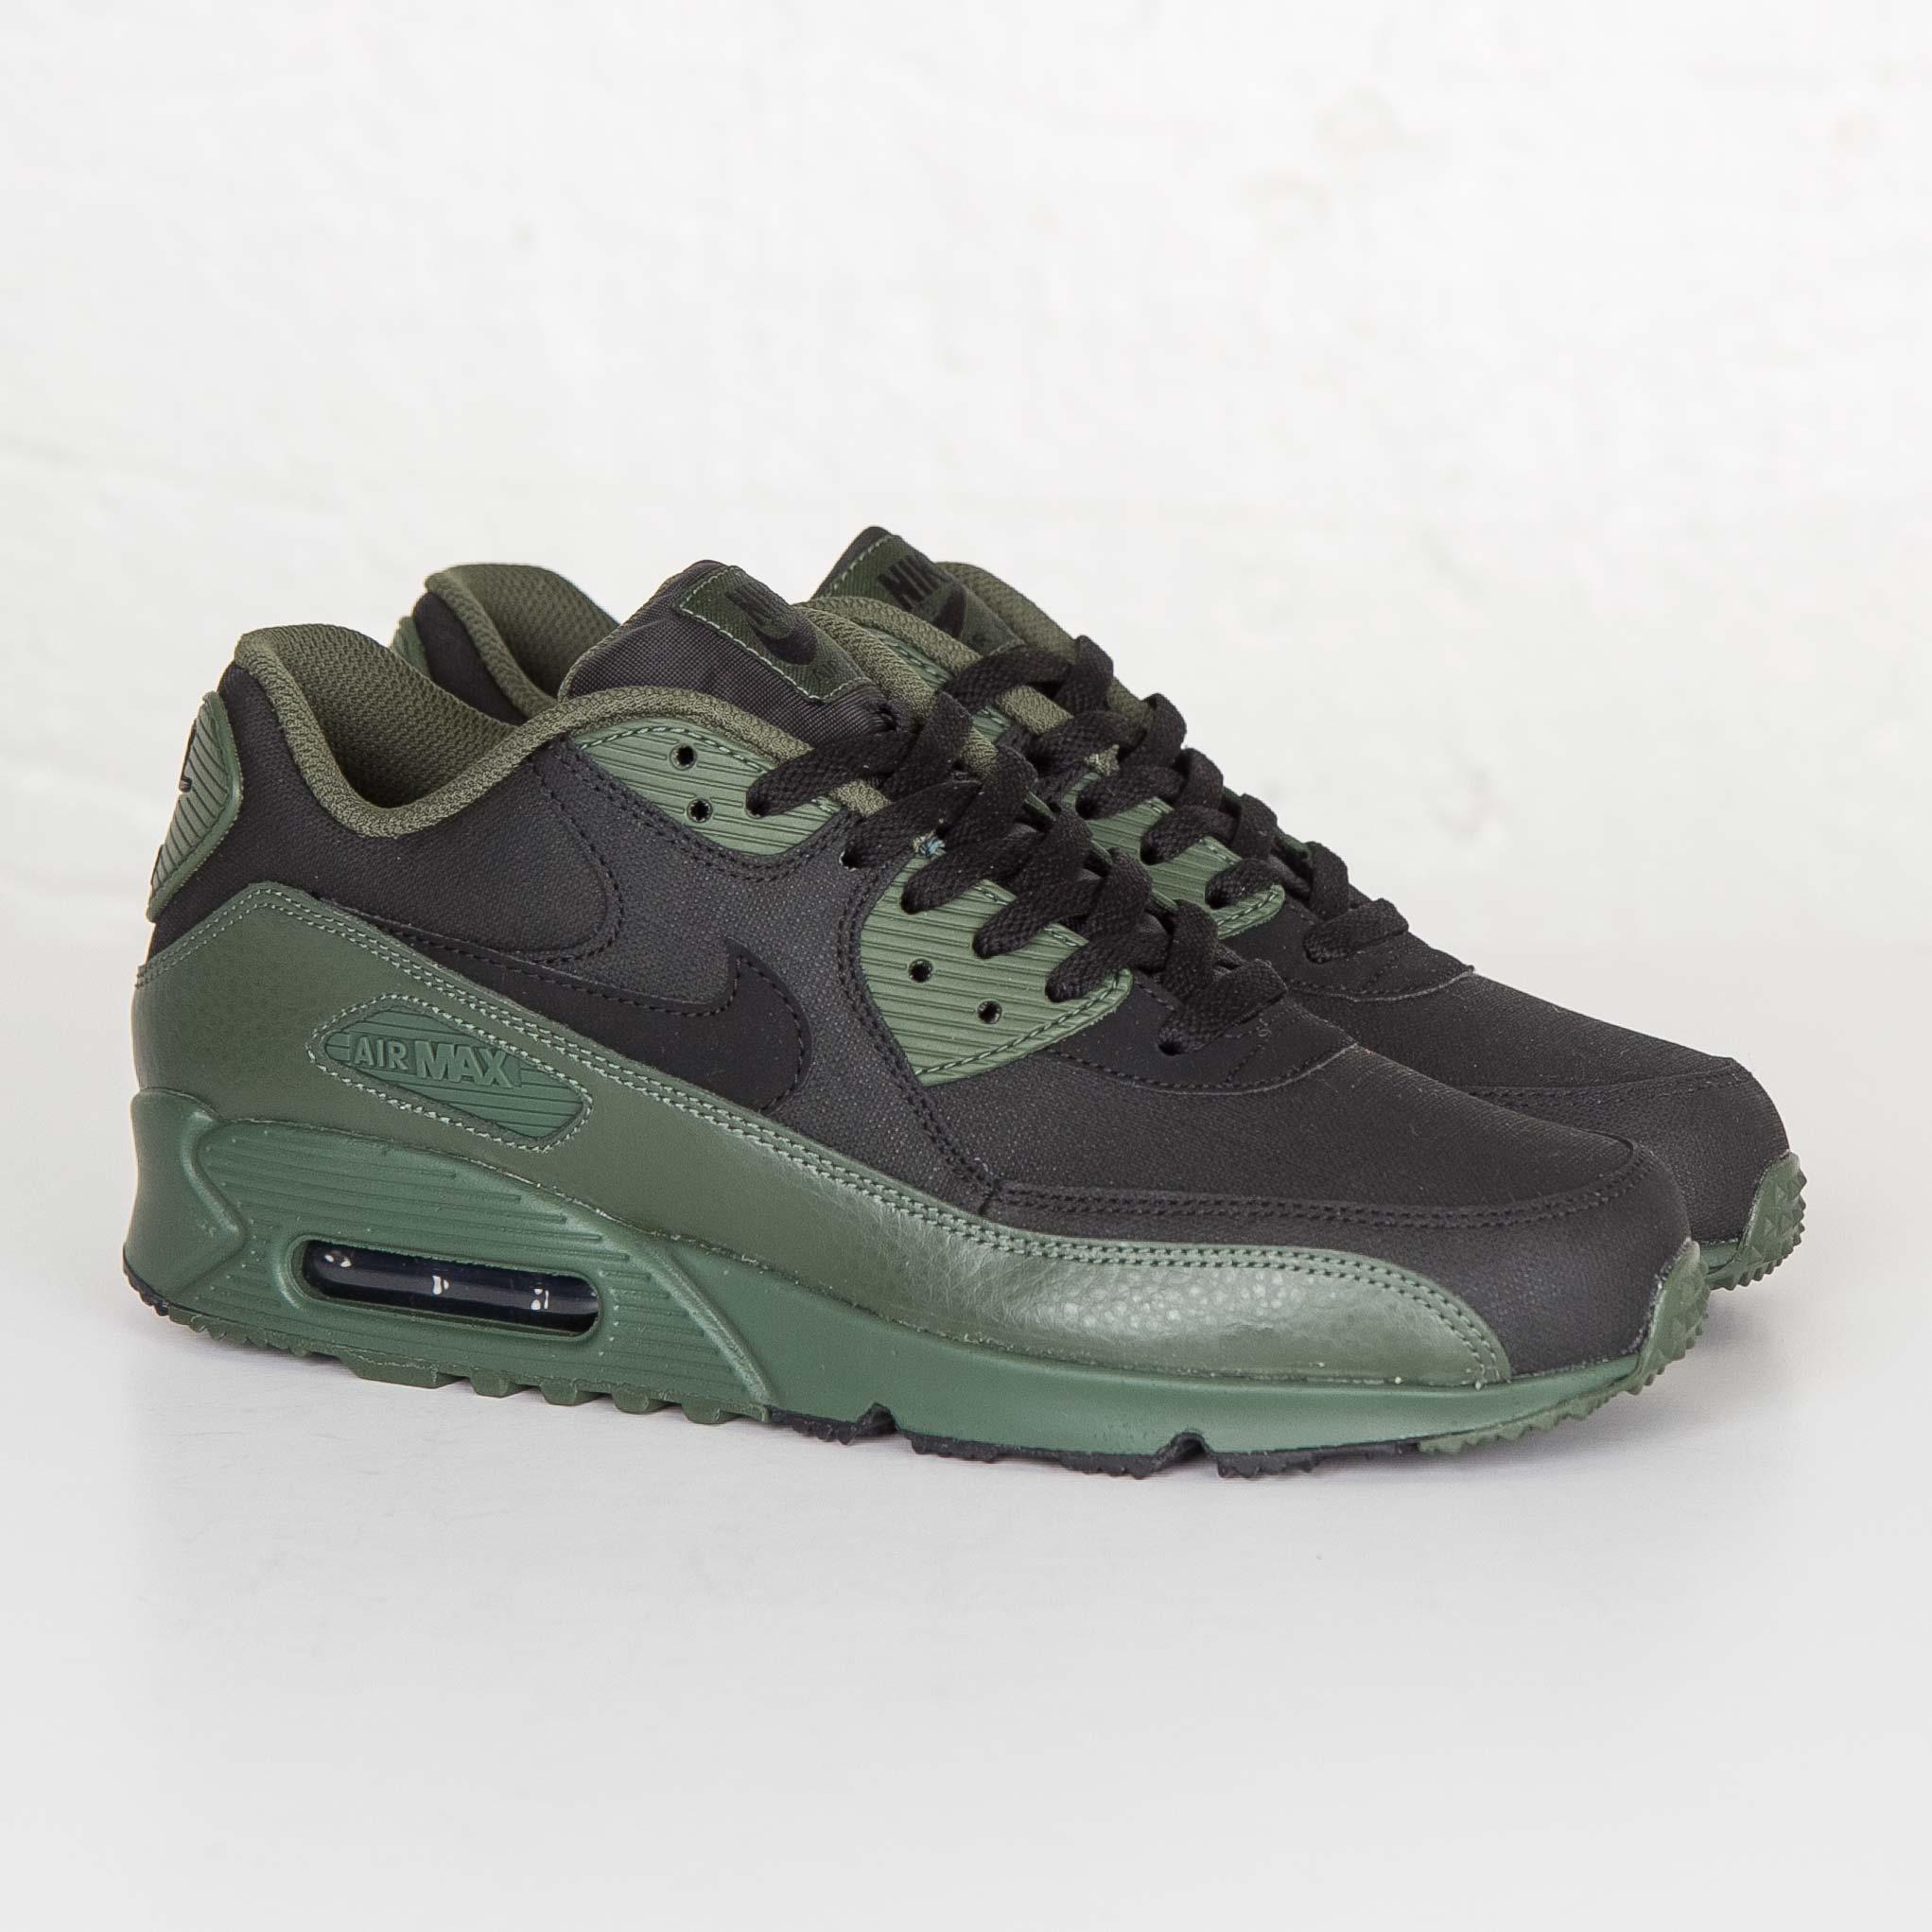 info pour a252b 9fba3 Nike Air Max 90 Winter Premium - 683282-303 - Sneakersnstuff ...